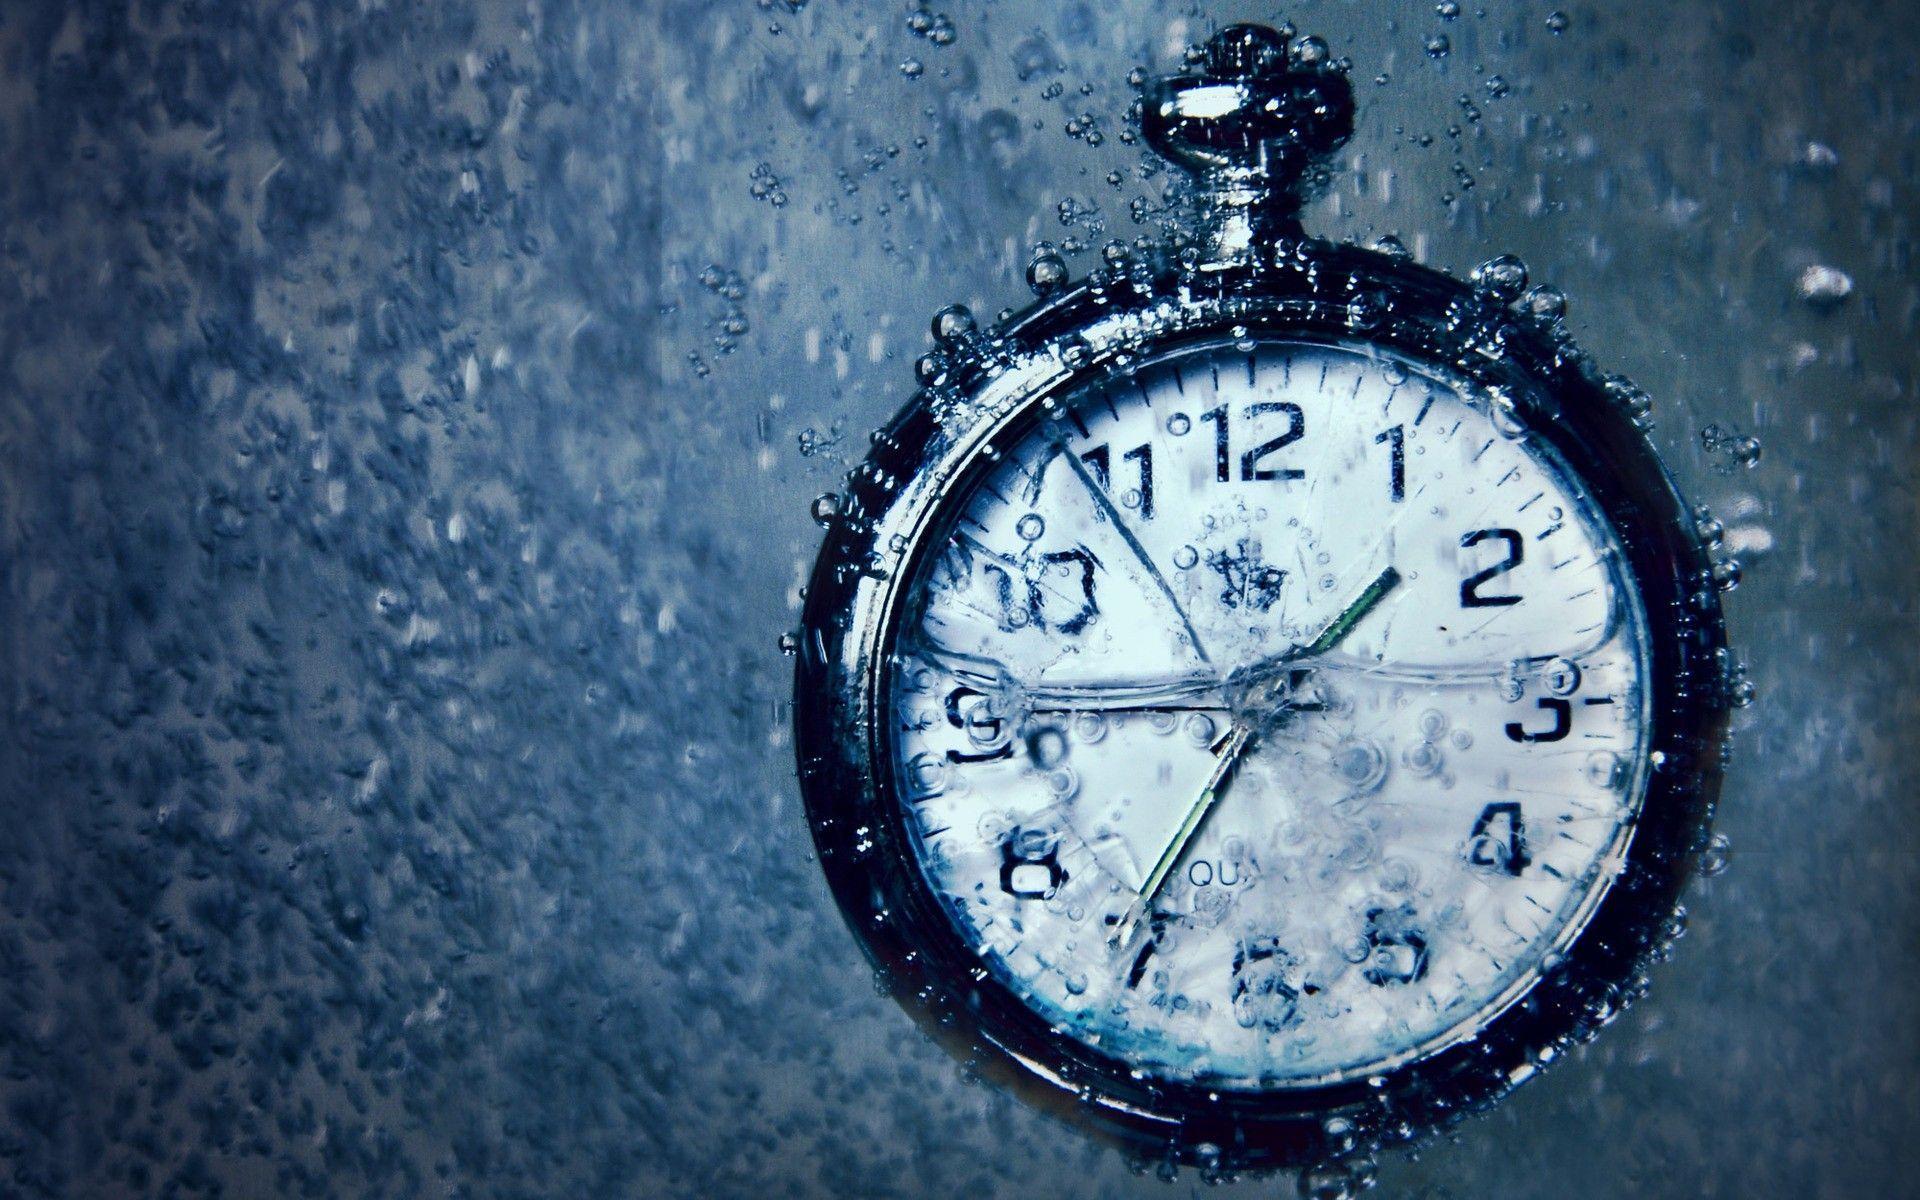 images of clocks